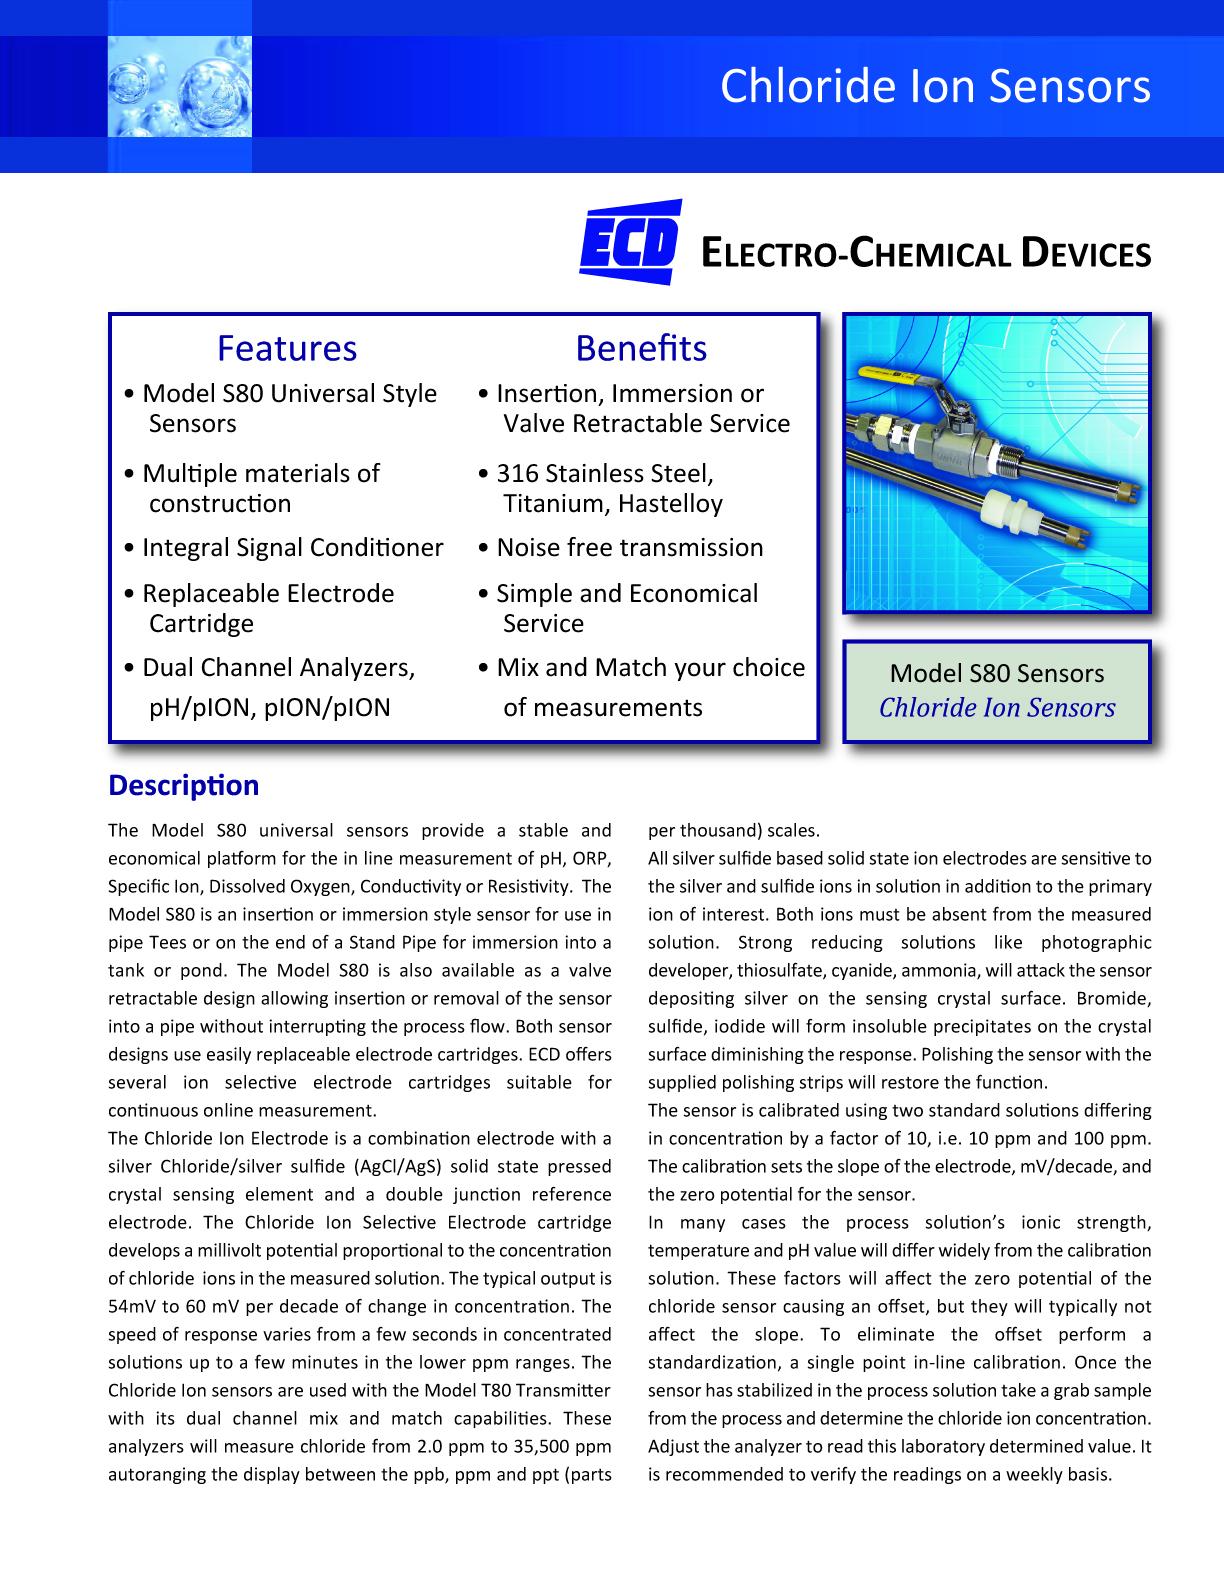 Chloride Sensor